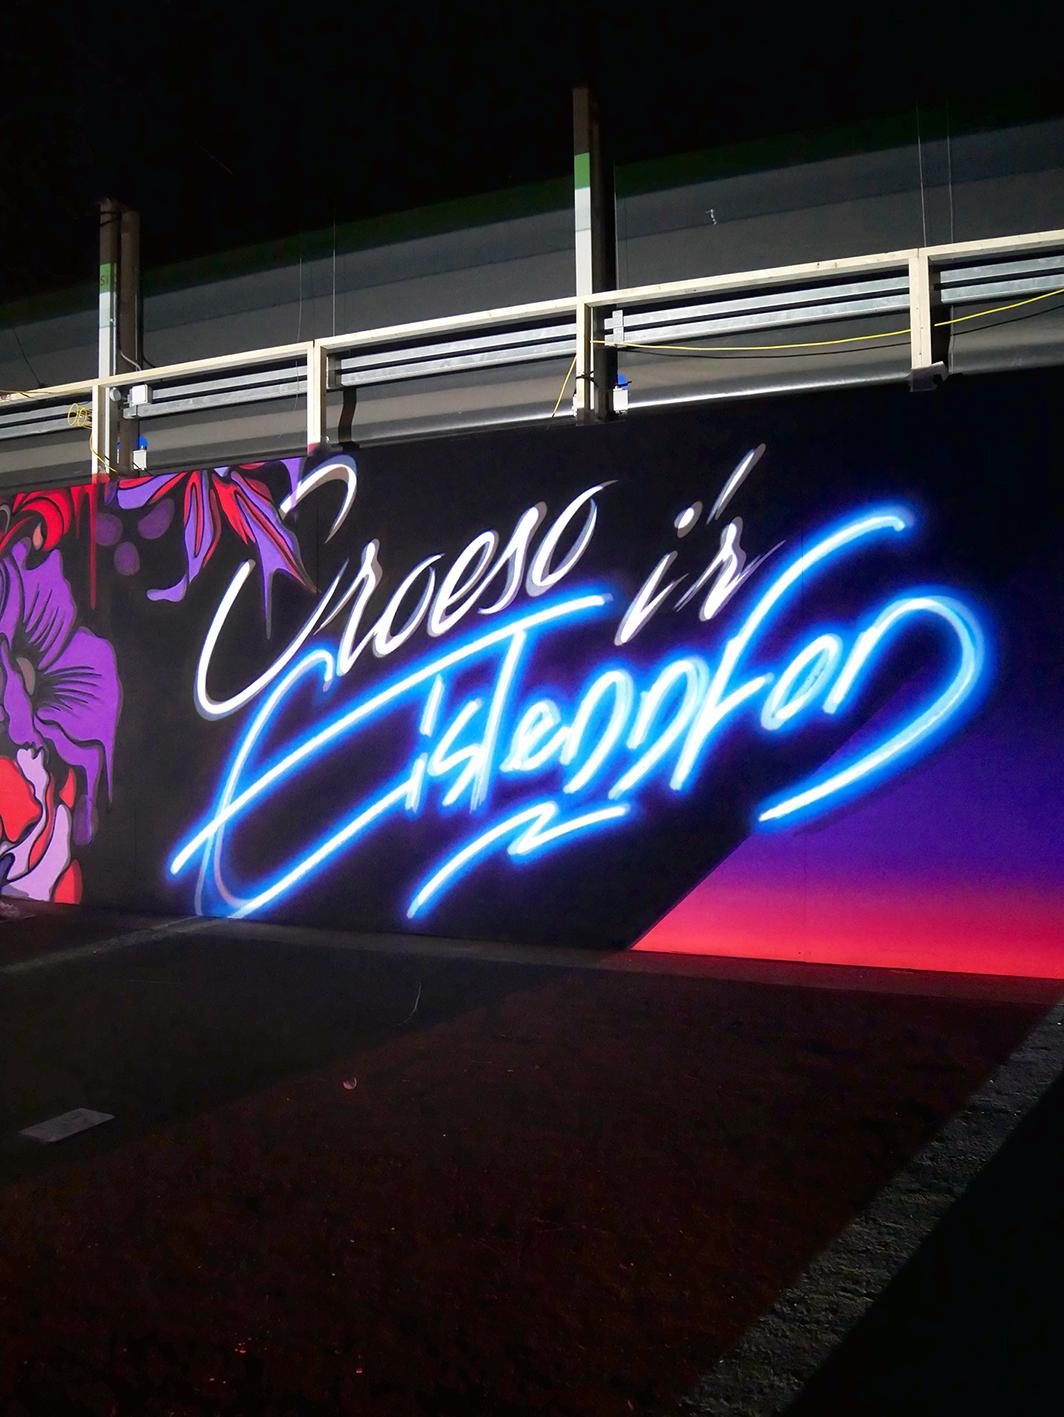 Nerone-street-art-Cardif-neone 3